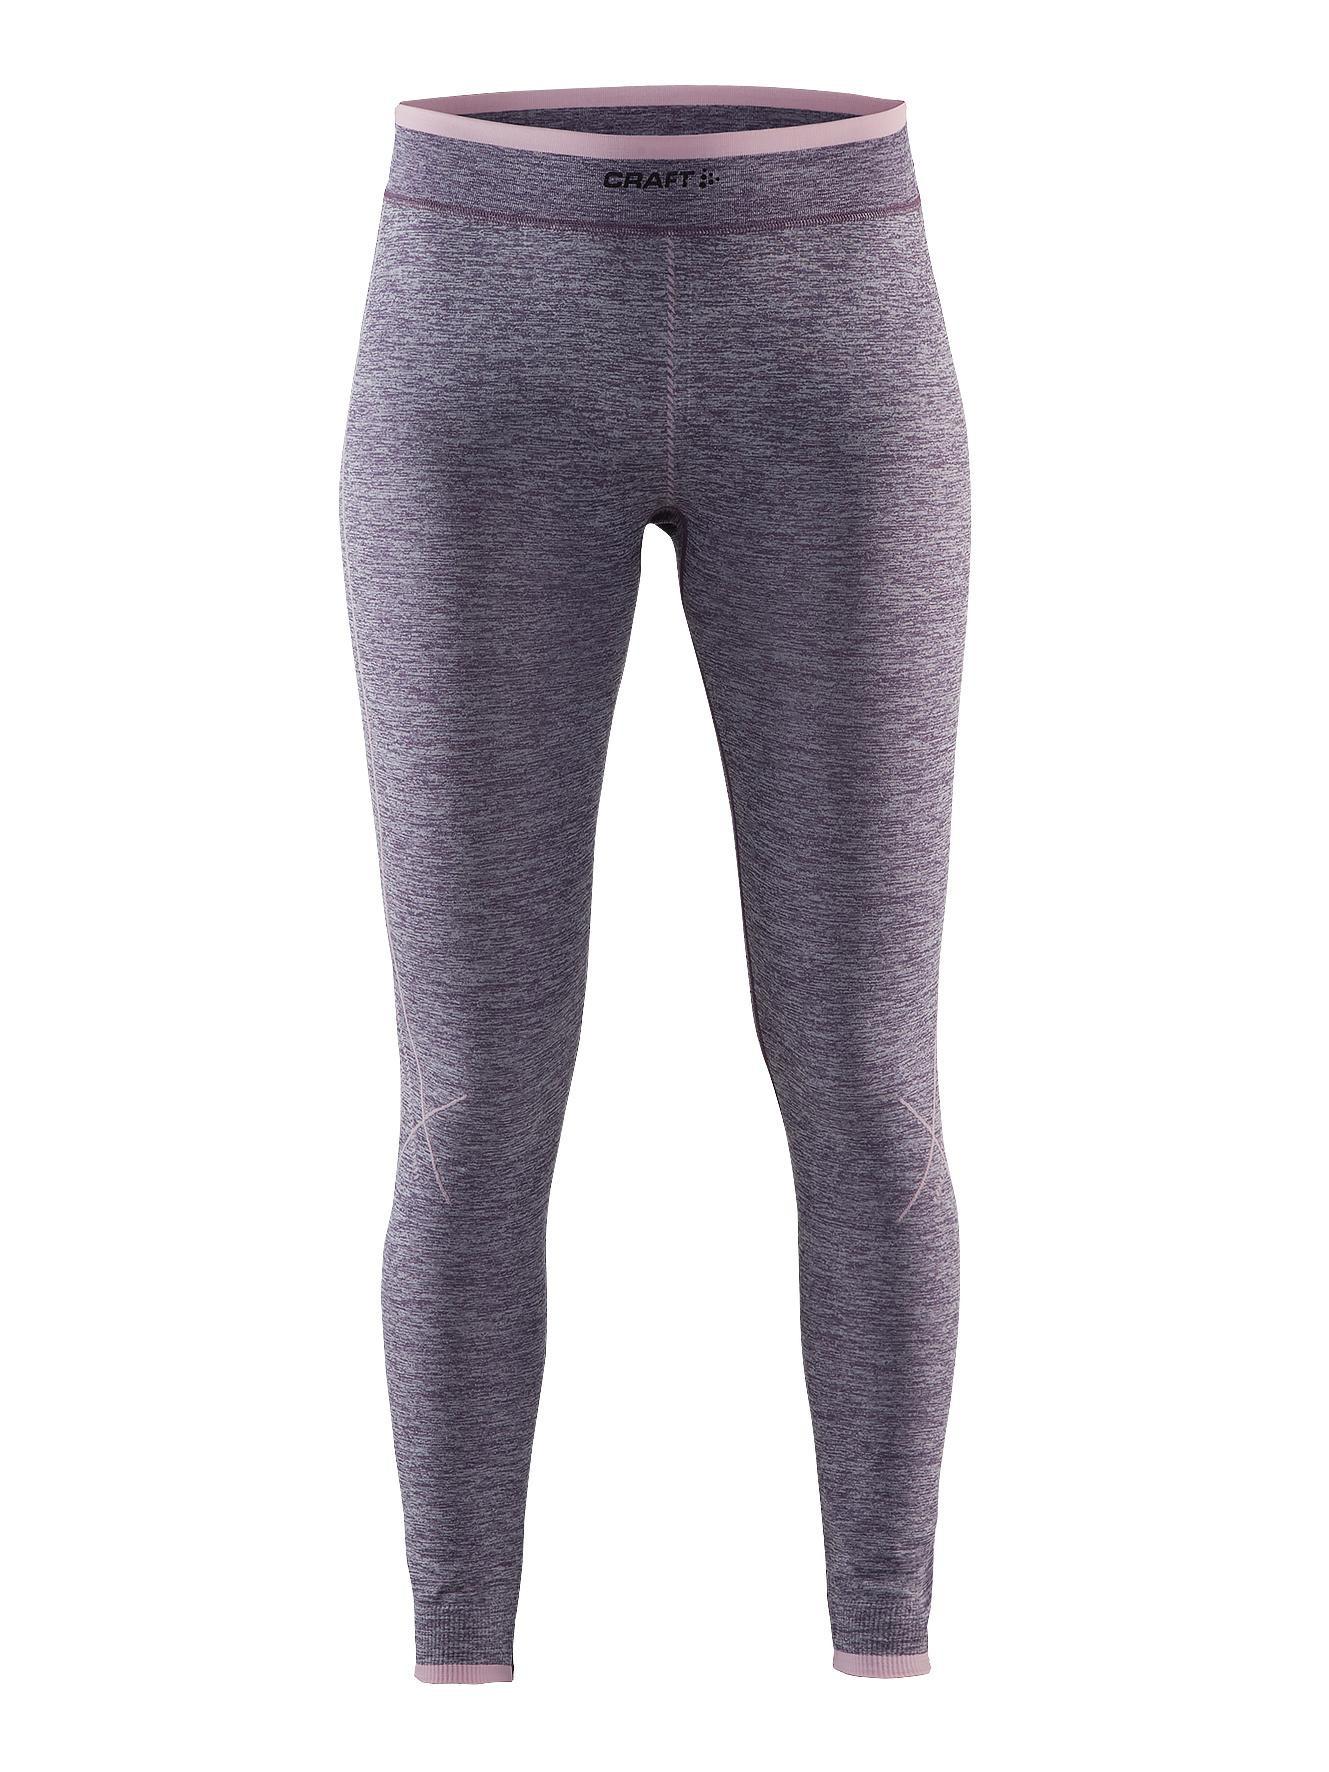 Термоштаны женские Craft Active Comfort Pants Woman Montana S